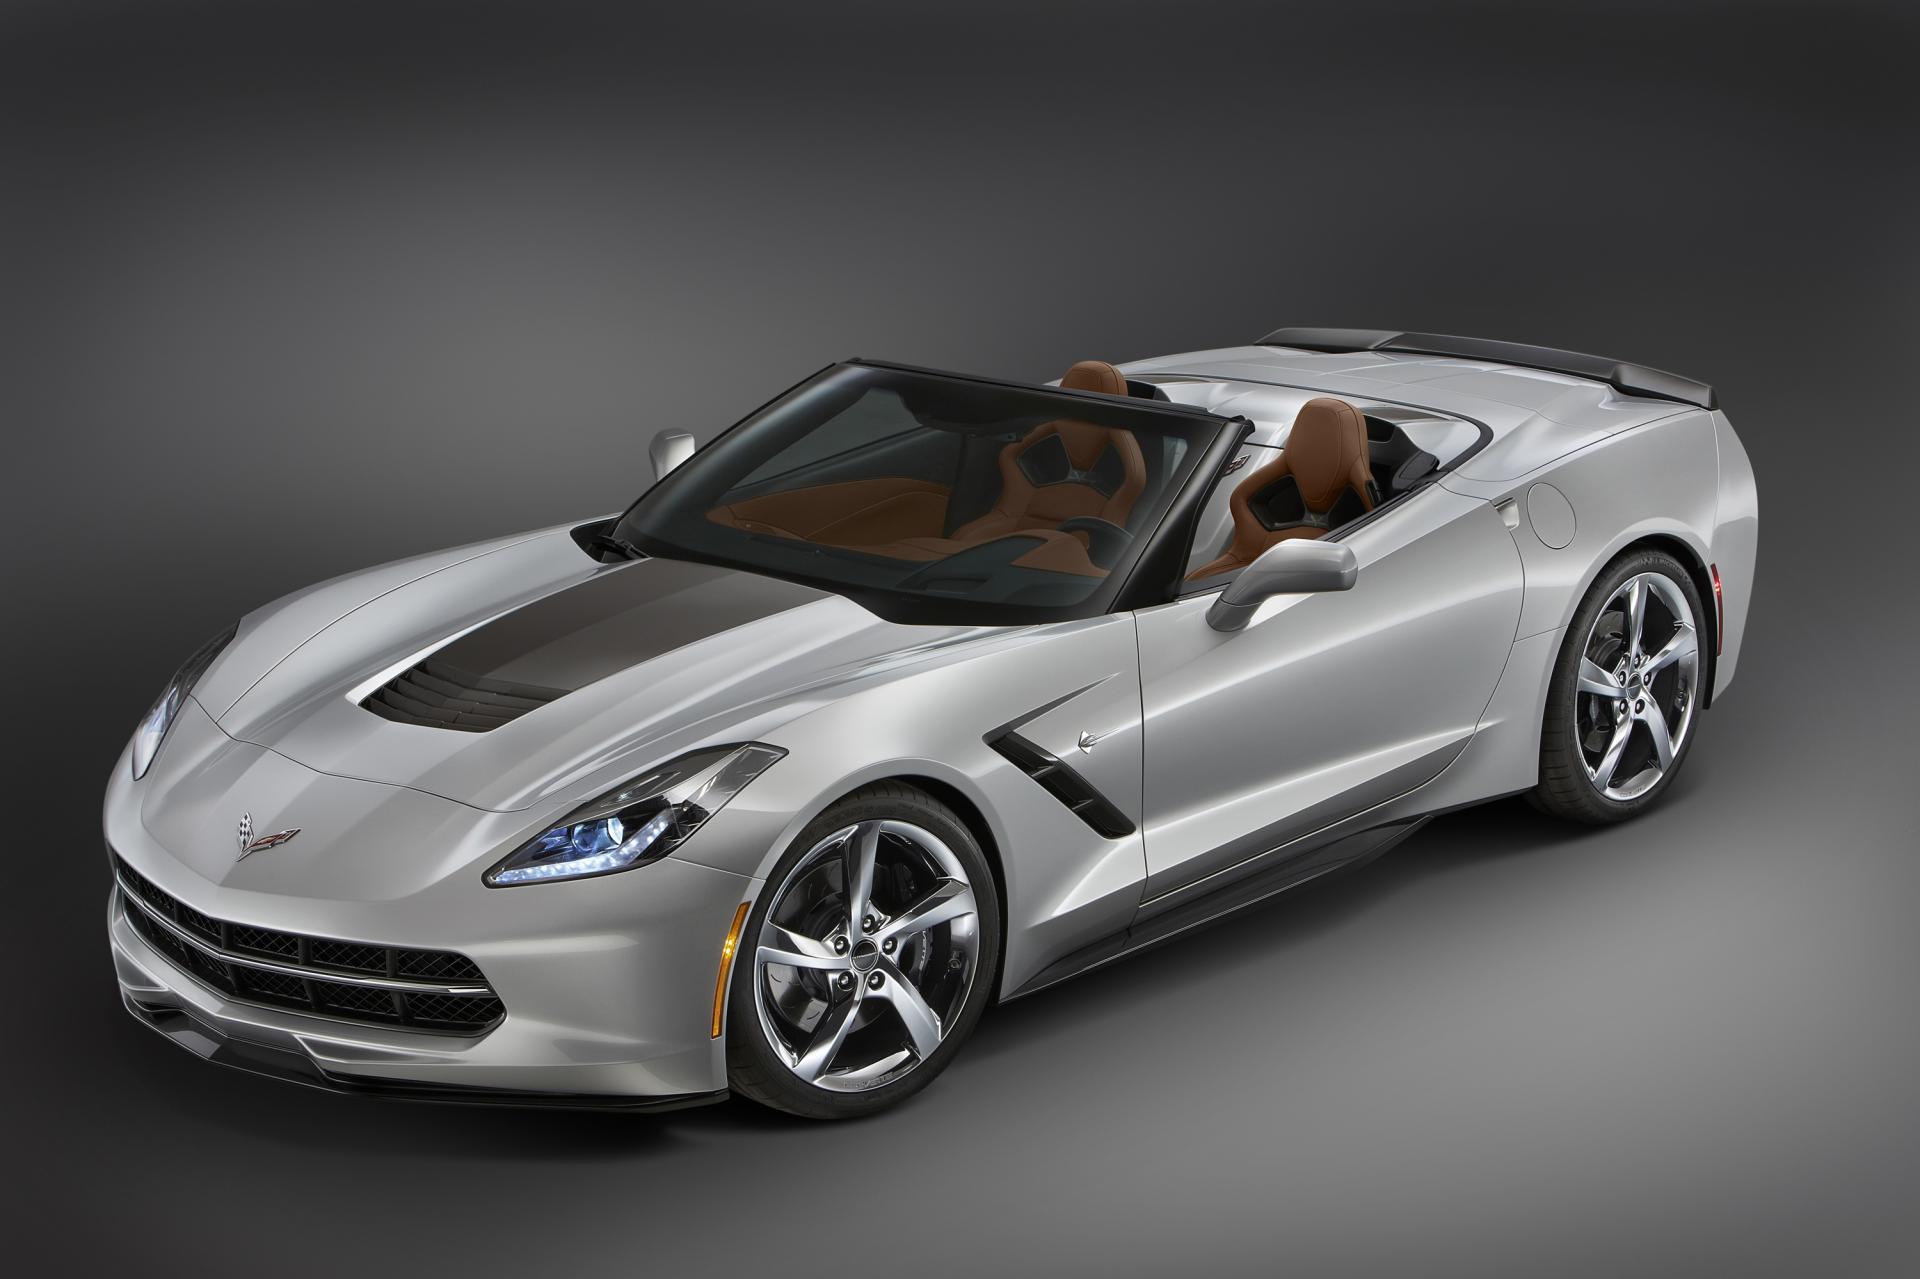 2013 Chevrolet Corvette Stingray Convertible Atlantic Concept News